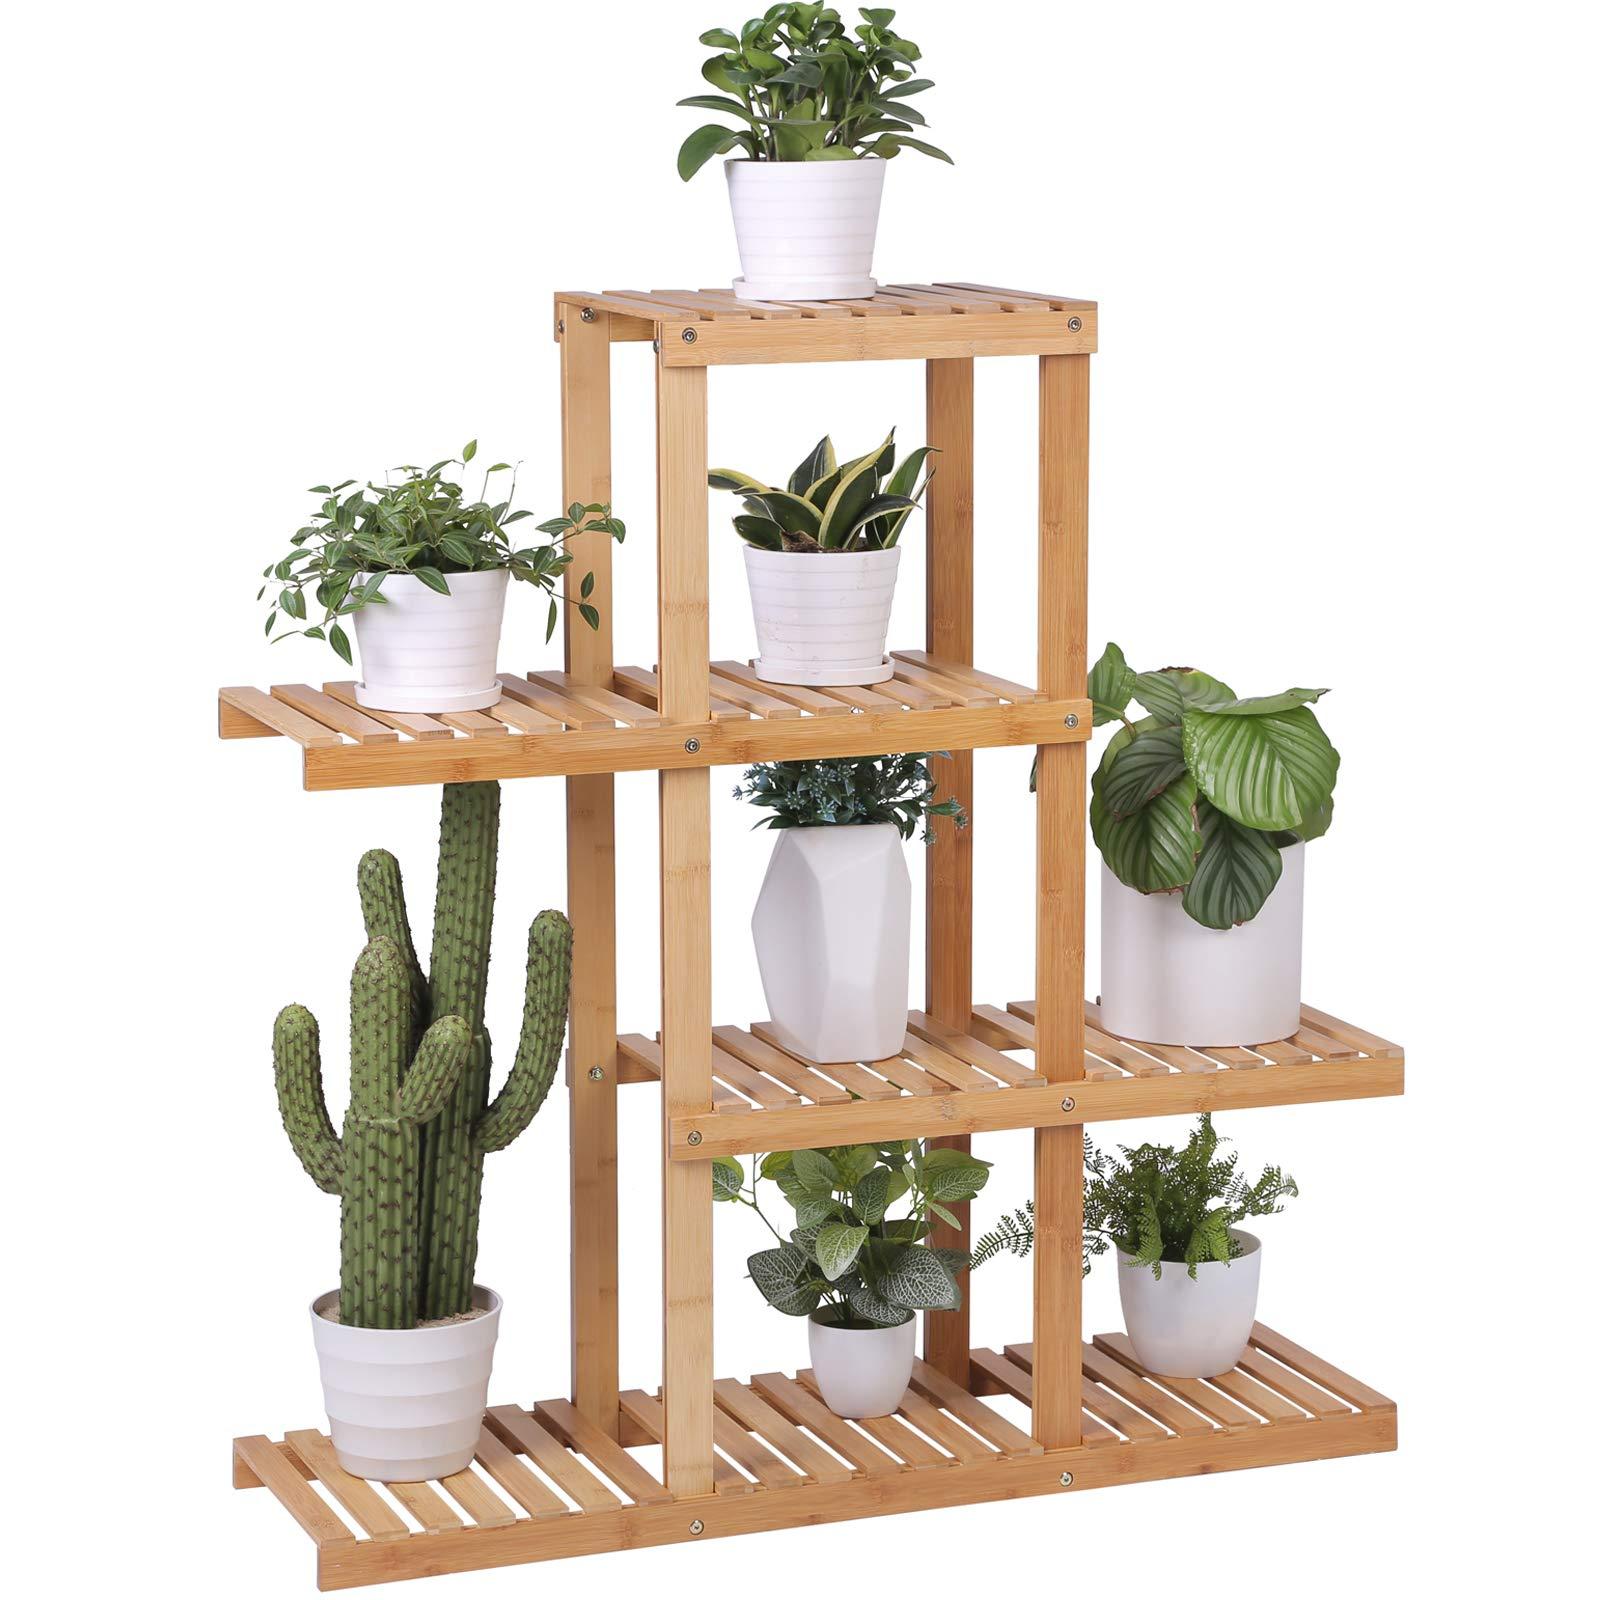 SONGMICS Bamboo Wood Plant Display Rack, Stand Shelf, Flower Pots Holder, 4 Tier Utility Shelving Standing Unit Storage Organizer Rack for Living Room Balcony Hallway Bathroom UBCB91N